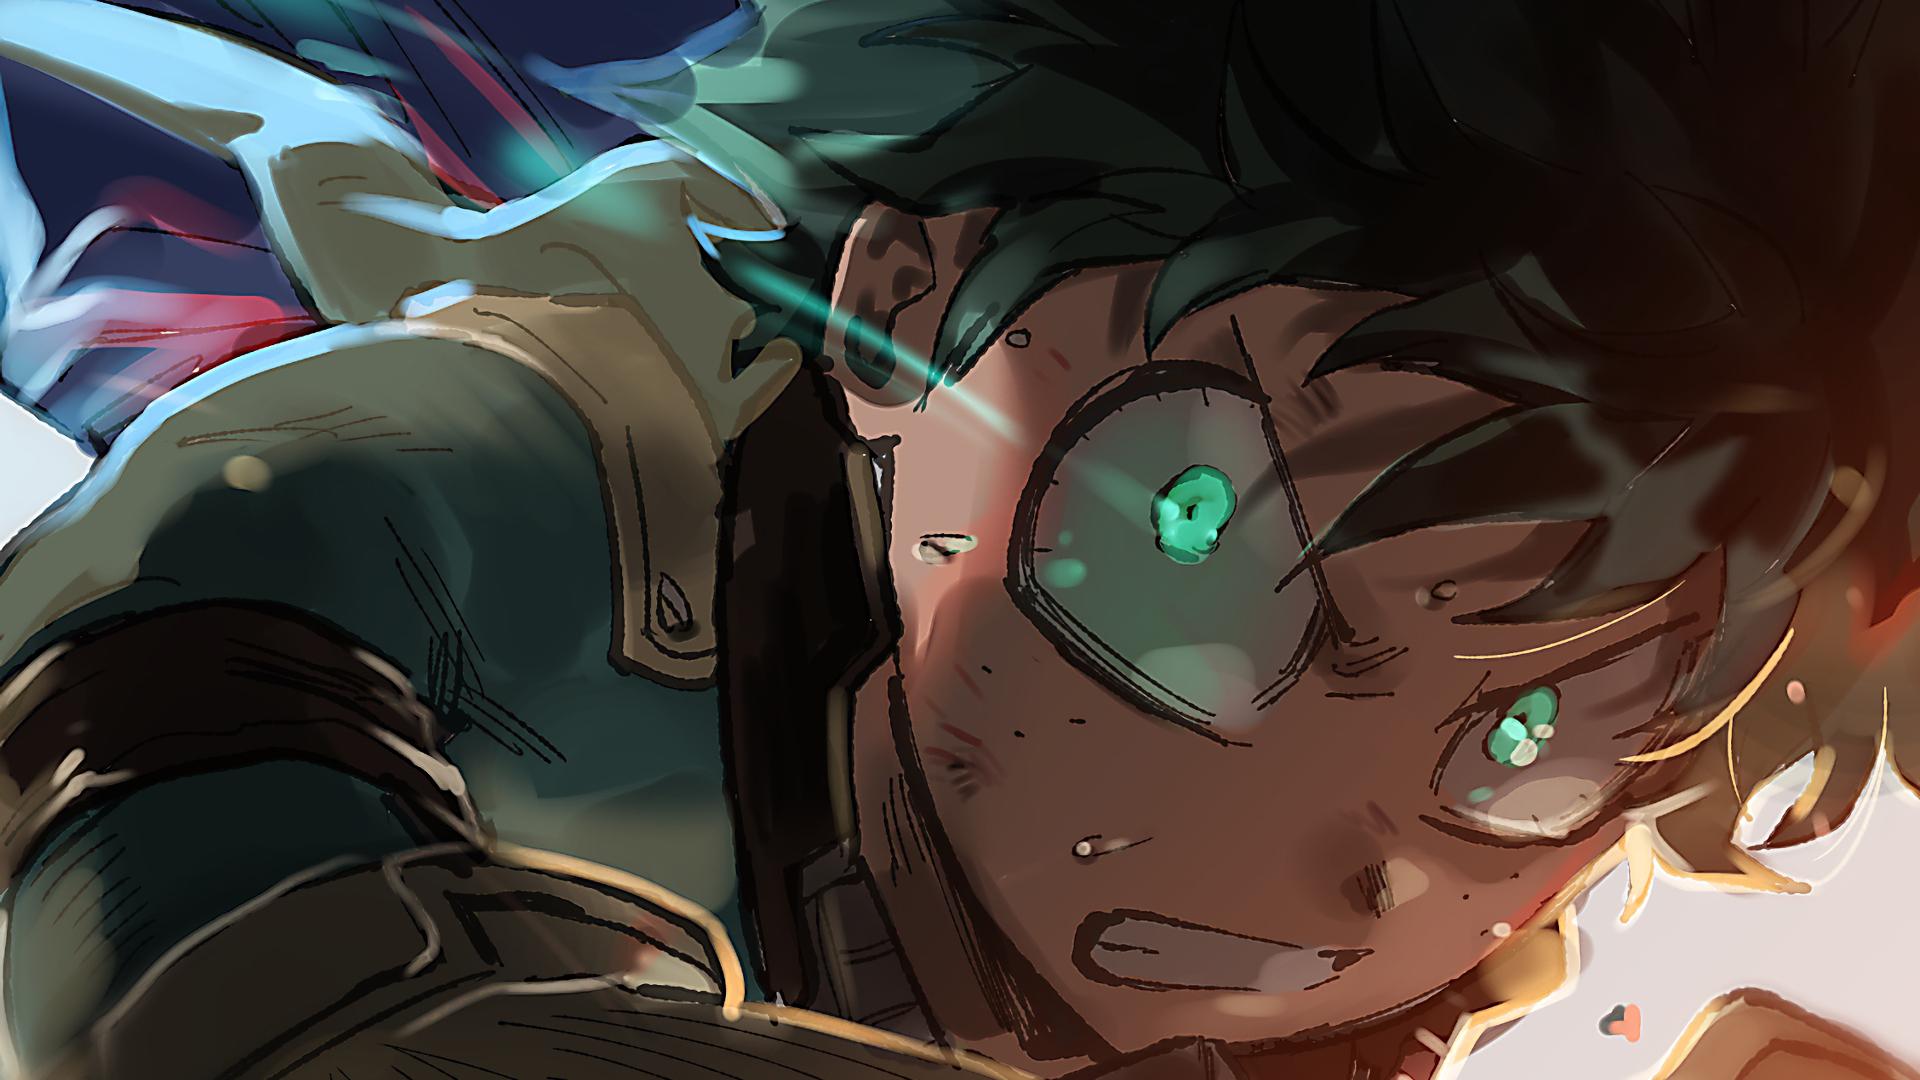 Download 1920x1080 Wallpaper Izuku Midoriya, Anime Boy, My ...